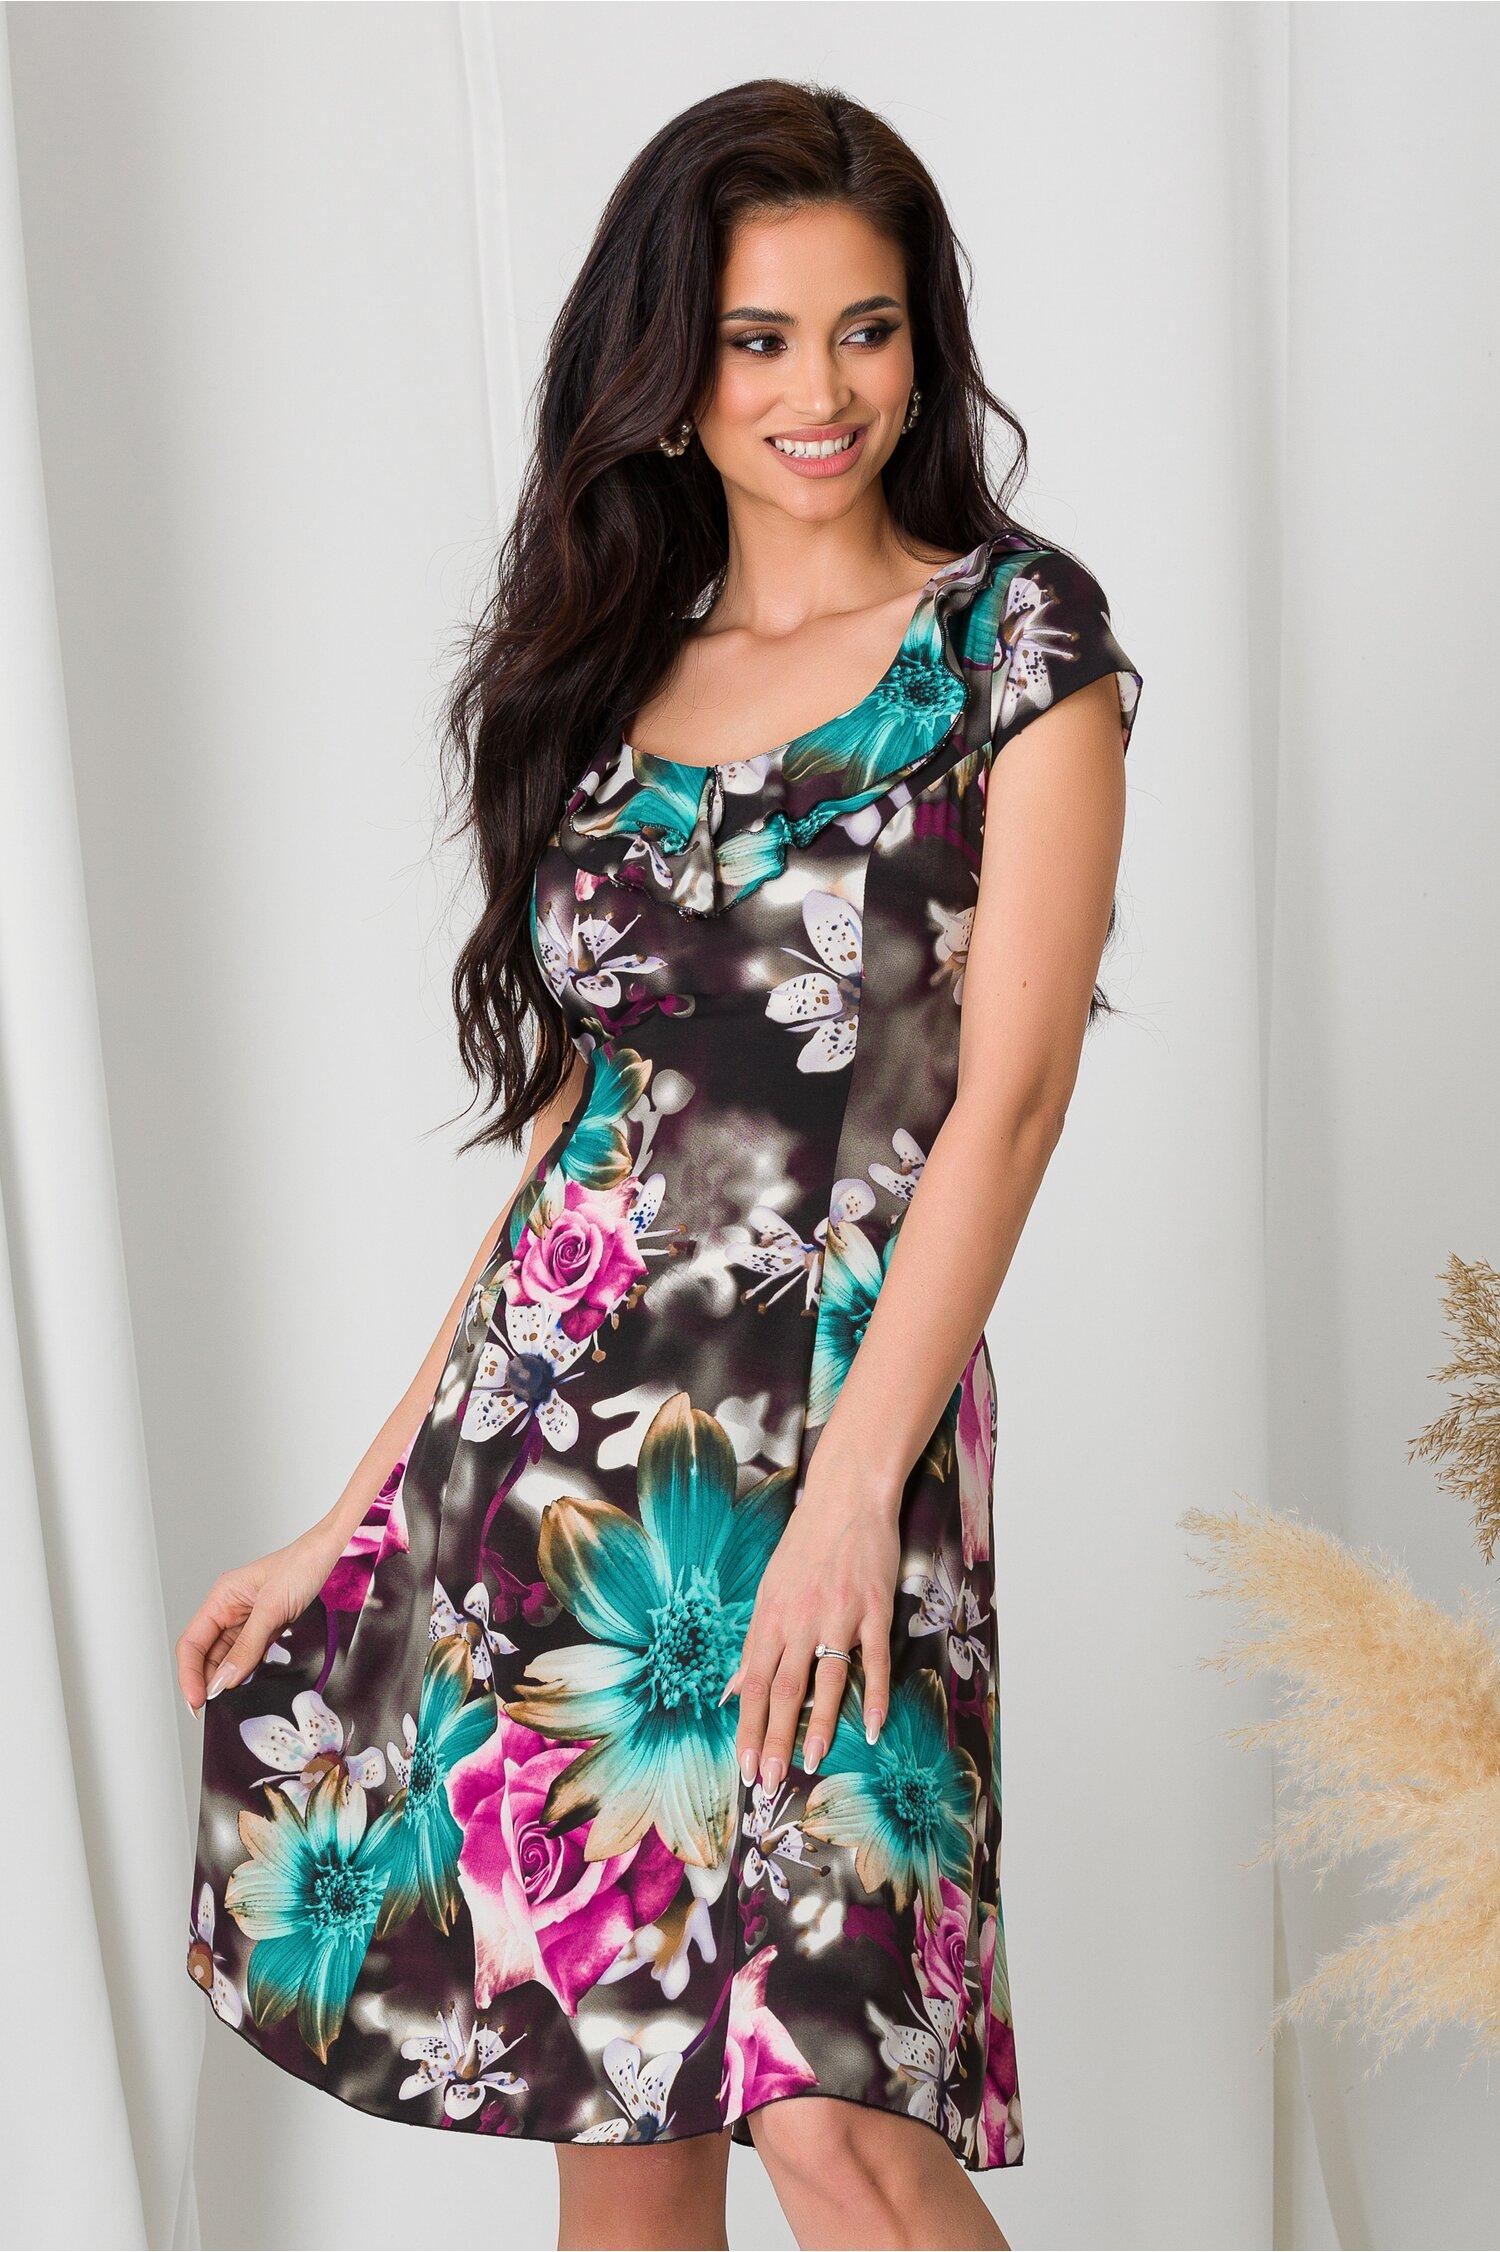 Rochie Kian neagra cu imprimeuri florale turcoaz si mov imagine dyfashion.ro 2021